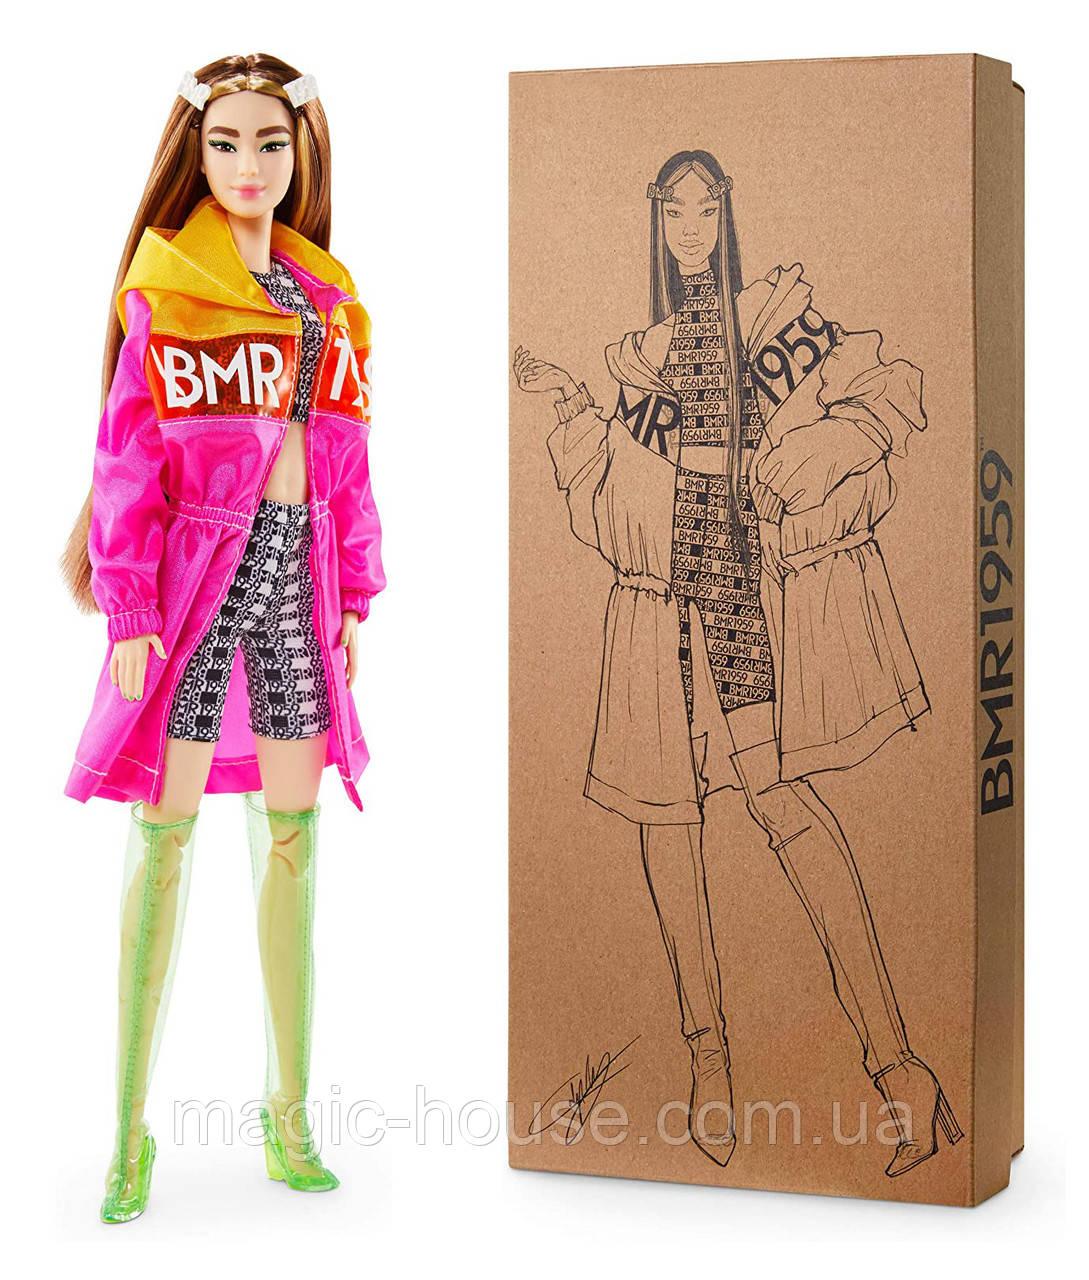 Кукла Barbie BMR1959 Jacket, Shorts & Vinyl Boots Fashion Doll оригинал от Mattel